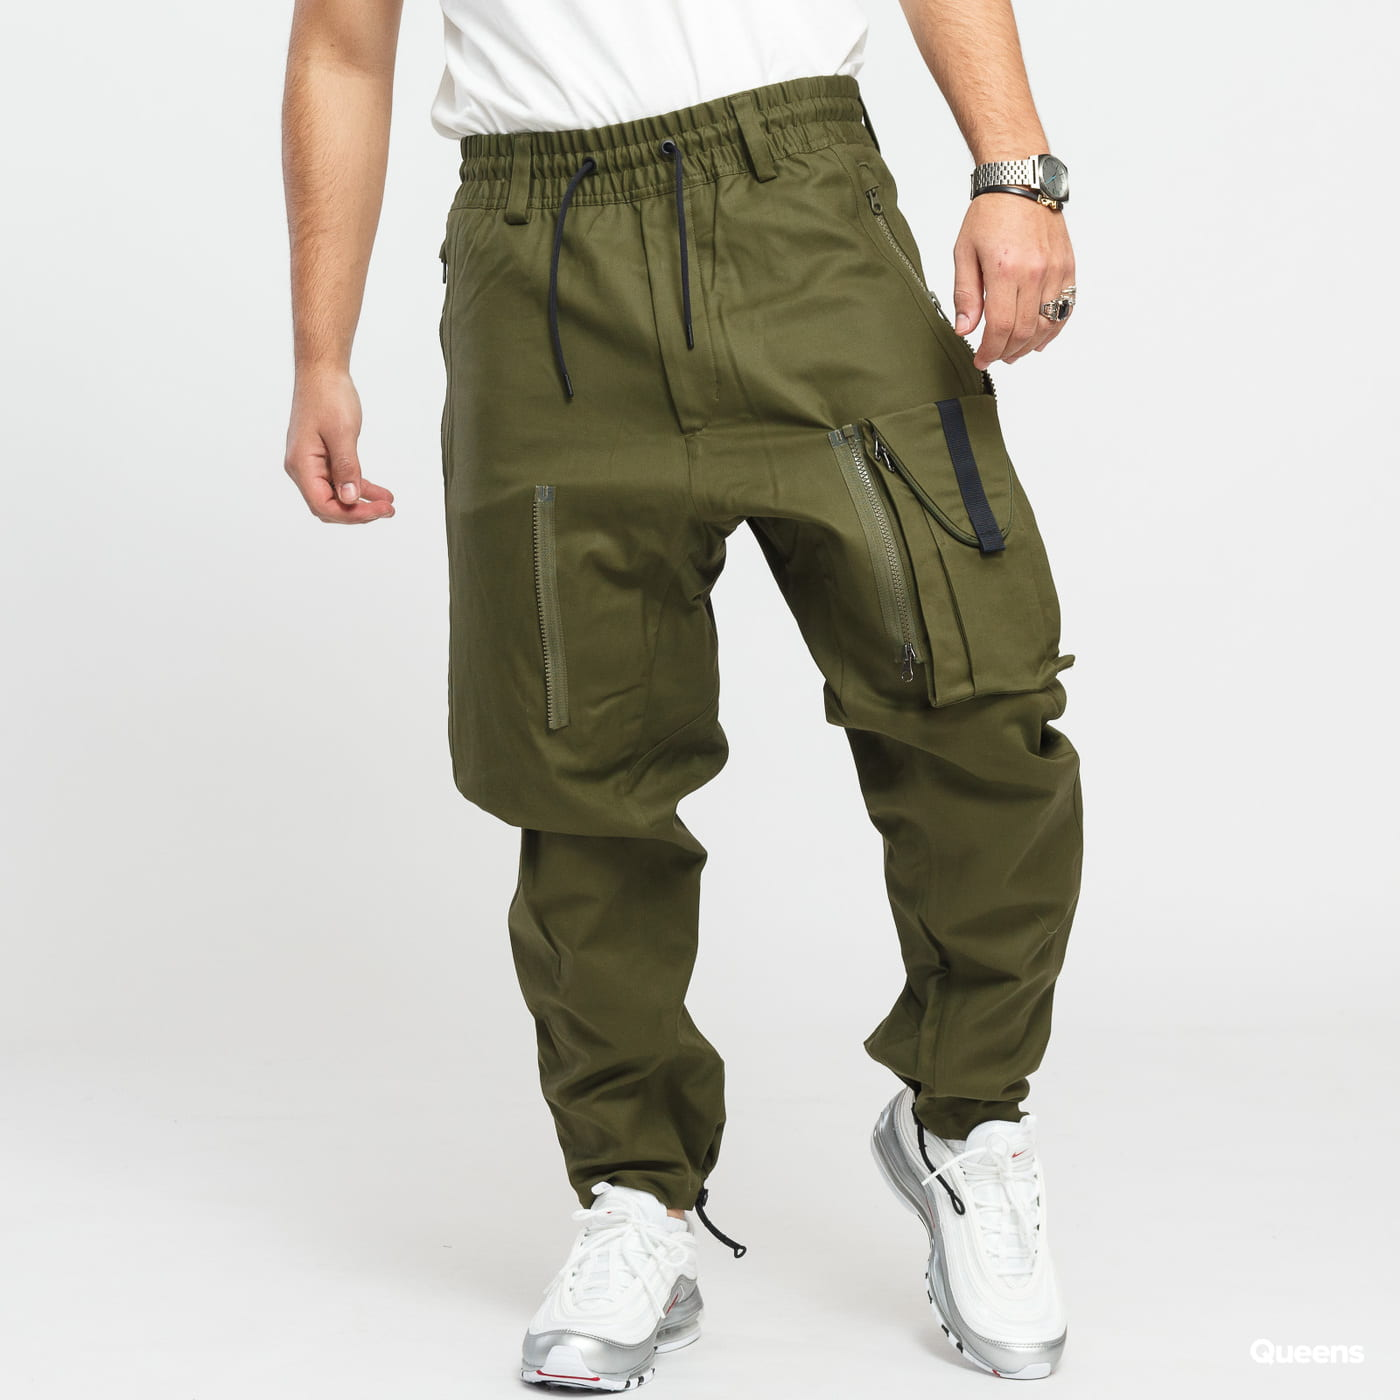 Track Pants Nike M Nrg Acg Cargo Pant Olive Aq3524 395